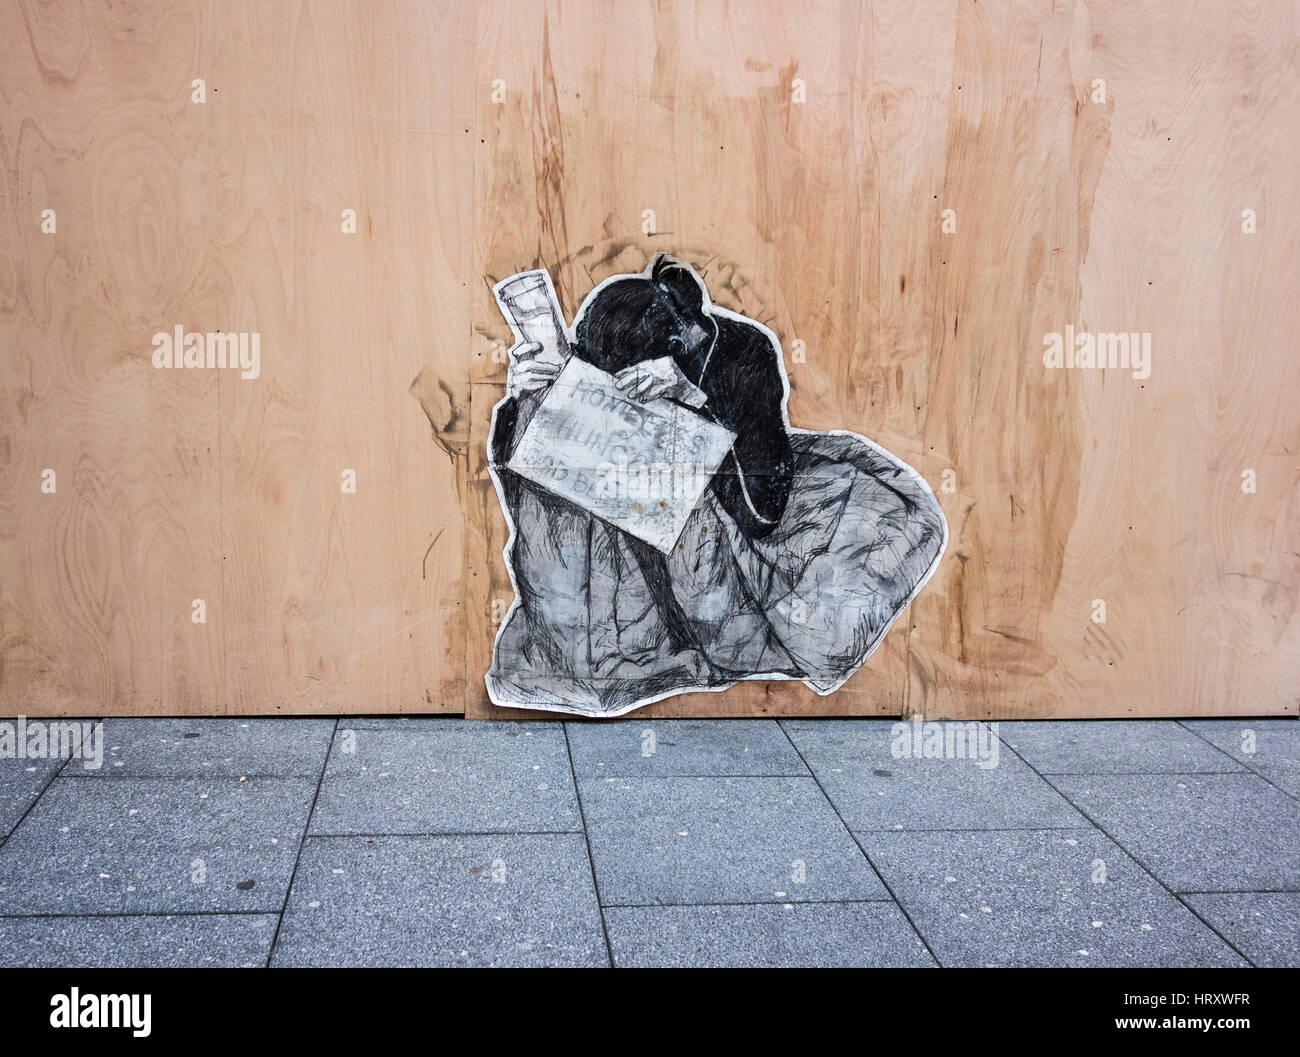 Artwork on a hoarding.Depicting homelessness. - Stock Image